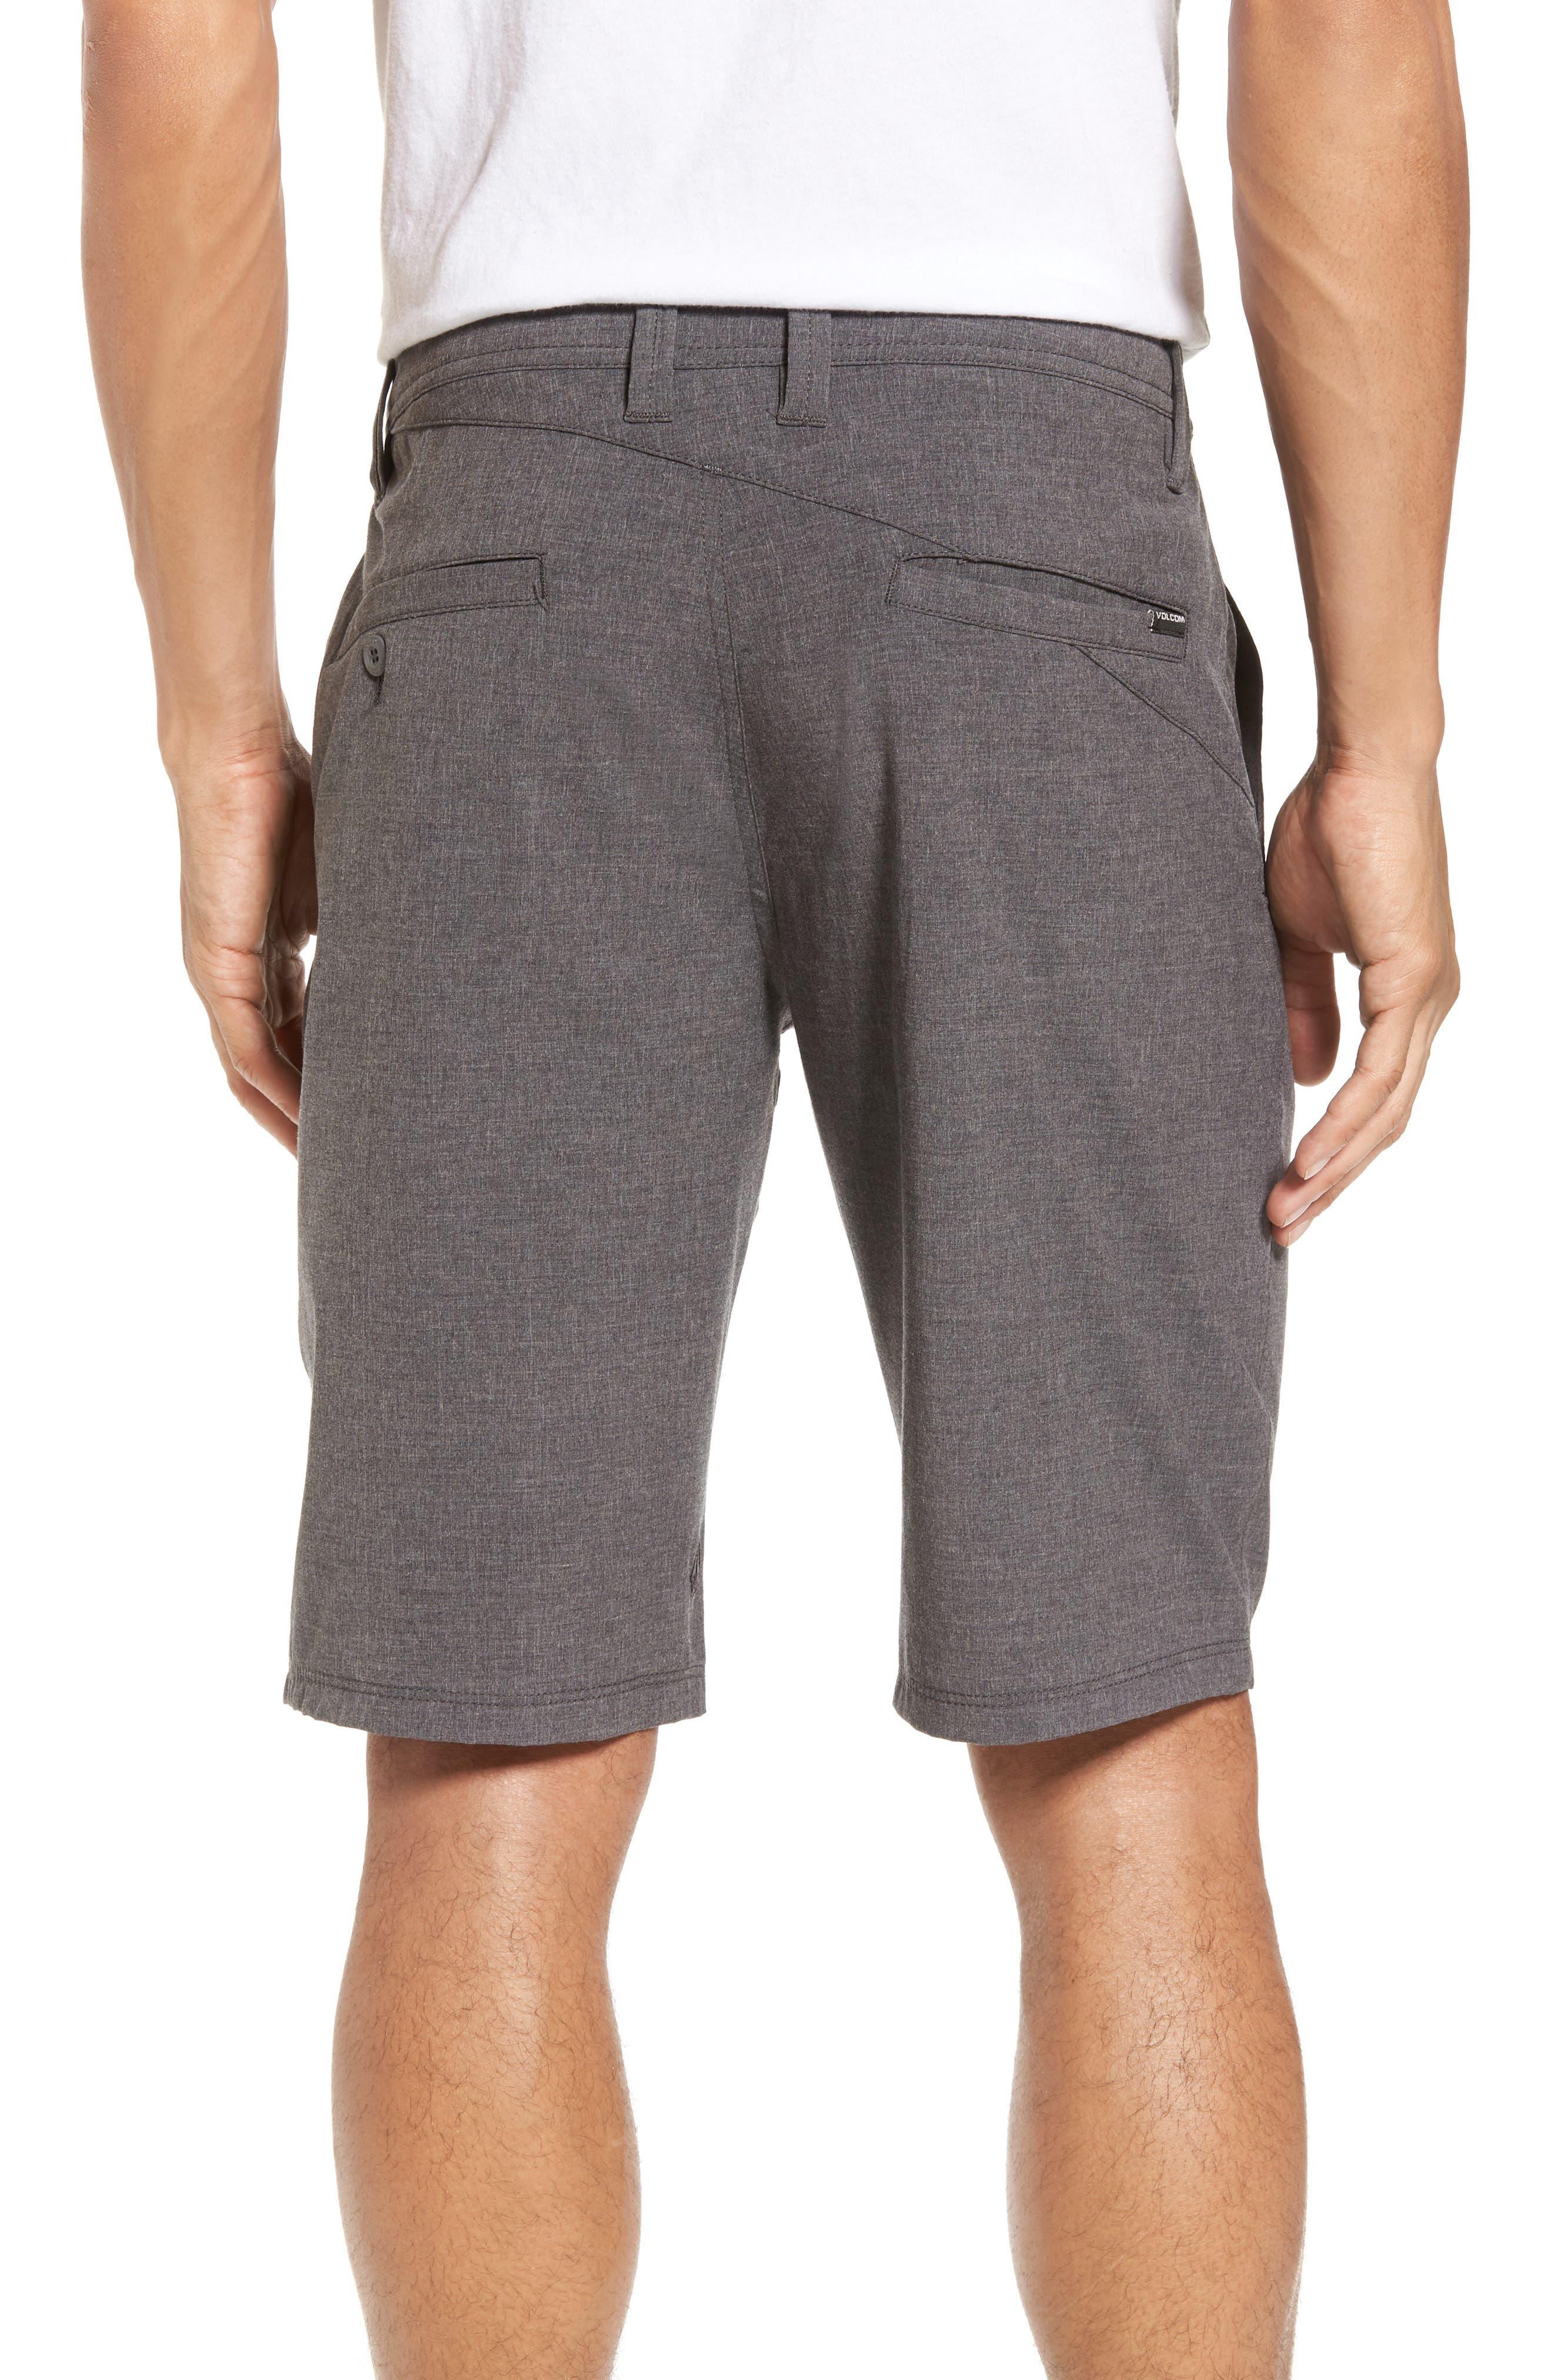 Hybrid Shorts,                             Alternate thumbnail 2, color,                             CHARCOAL